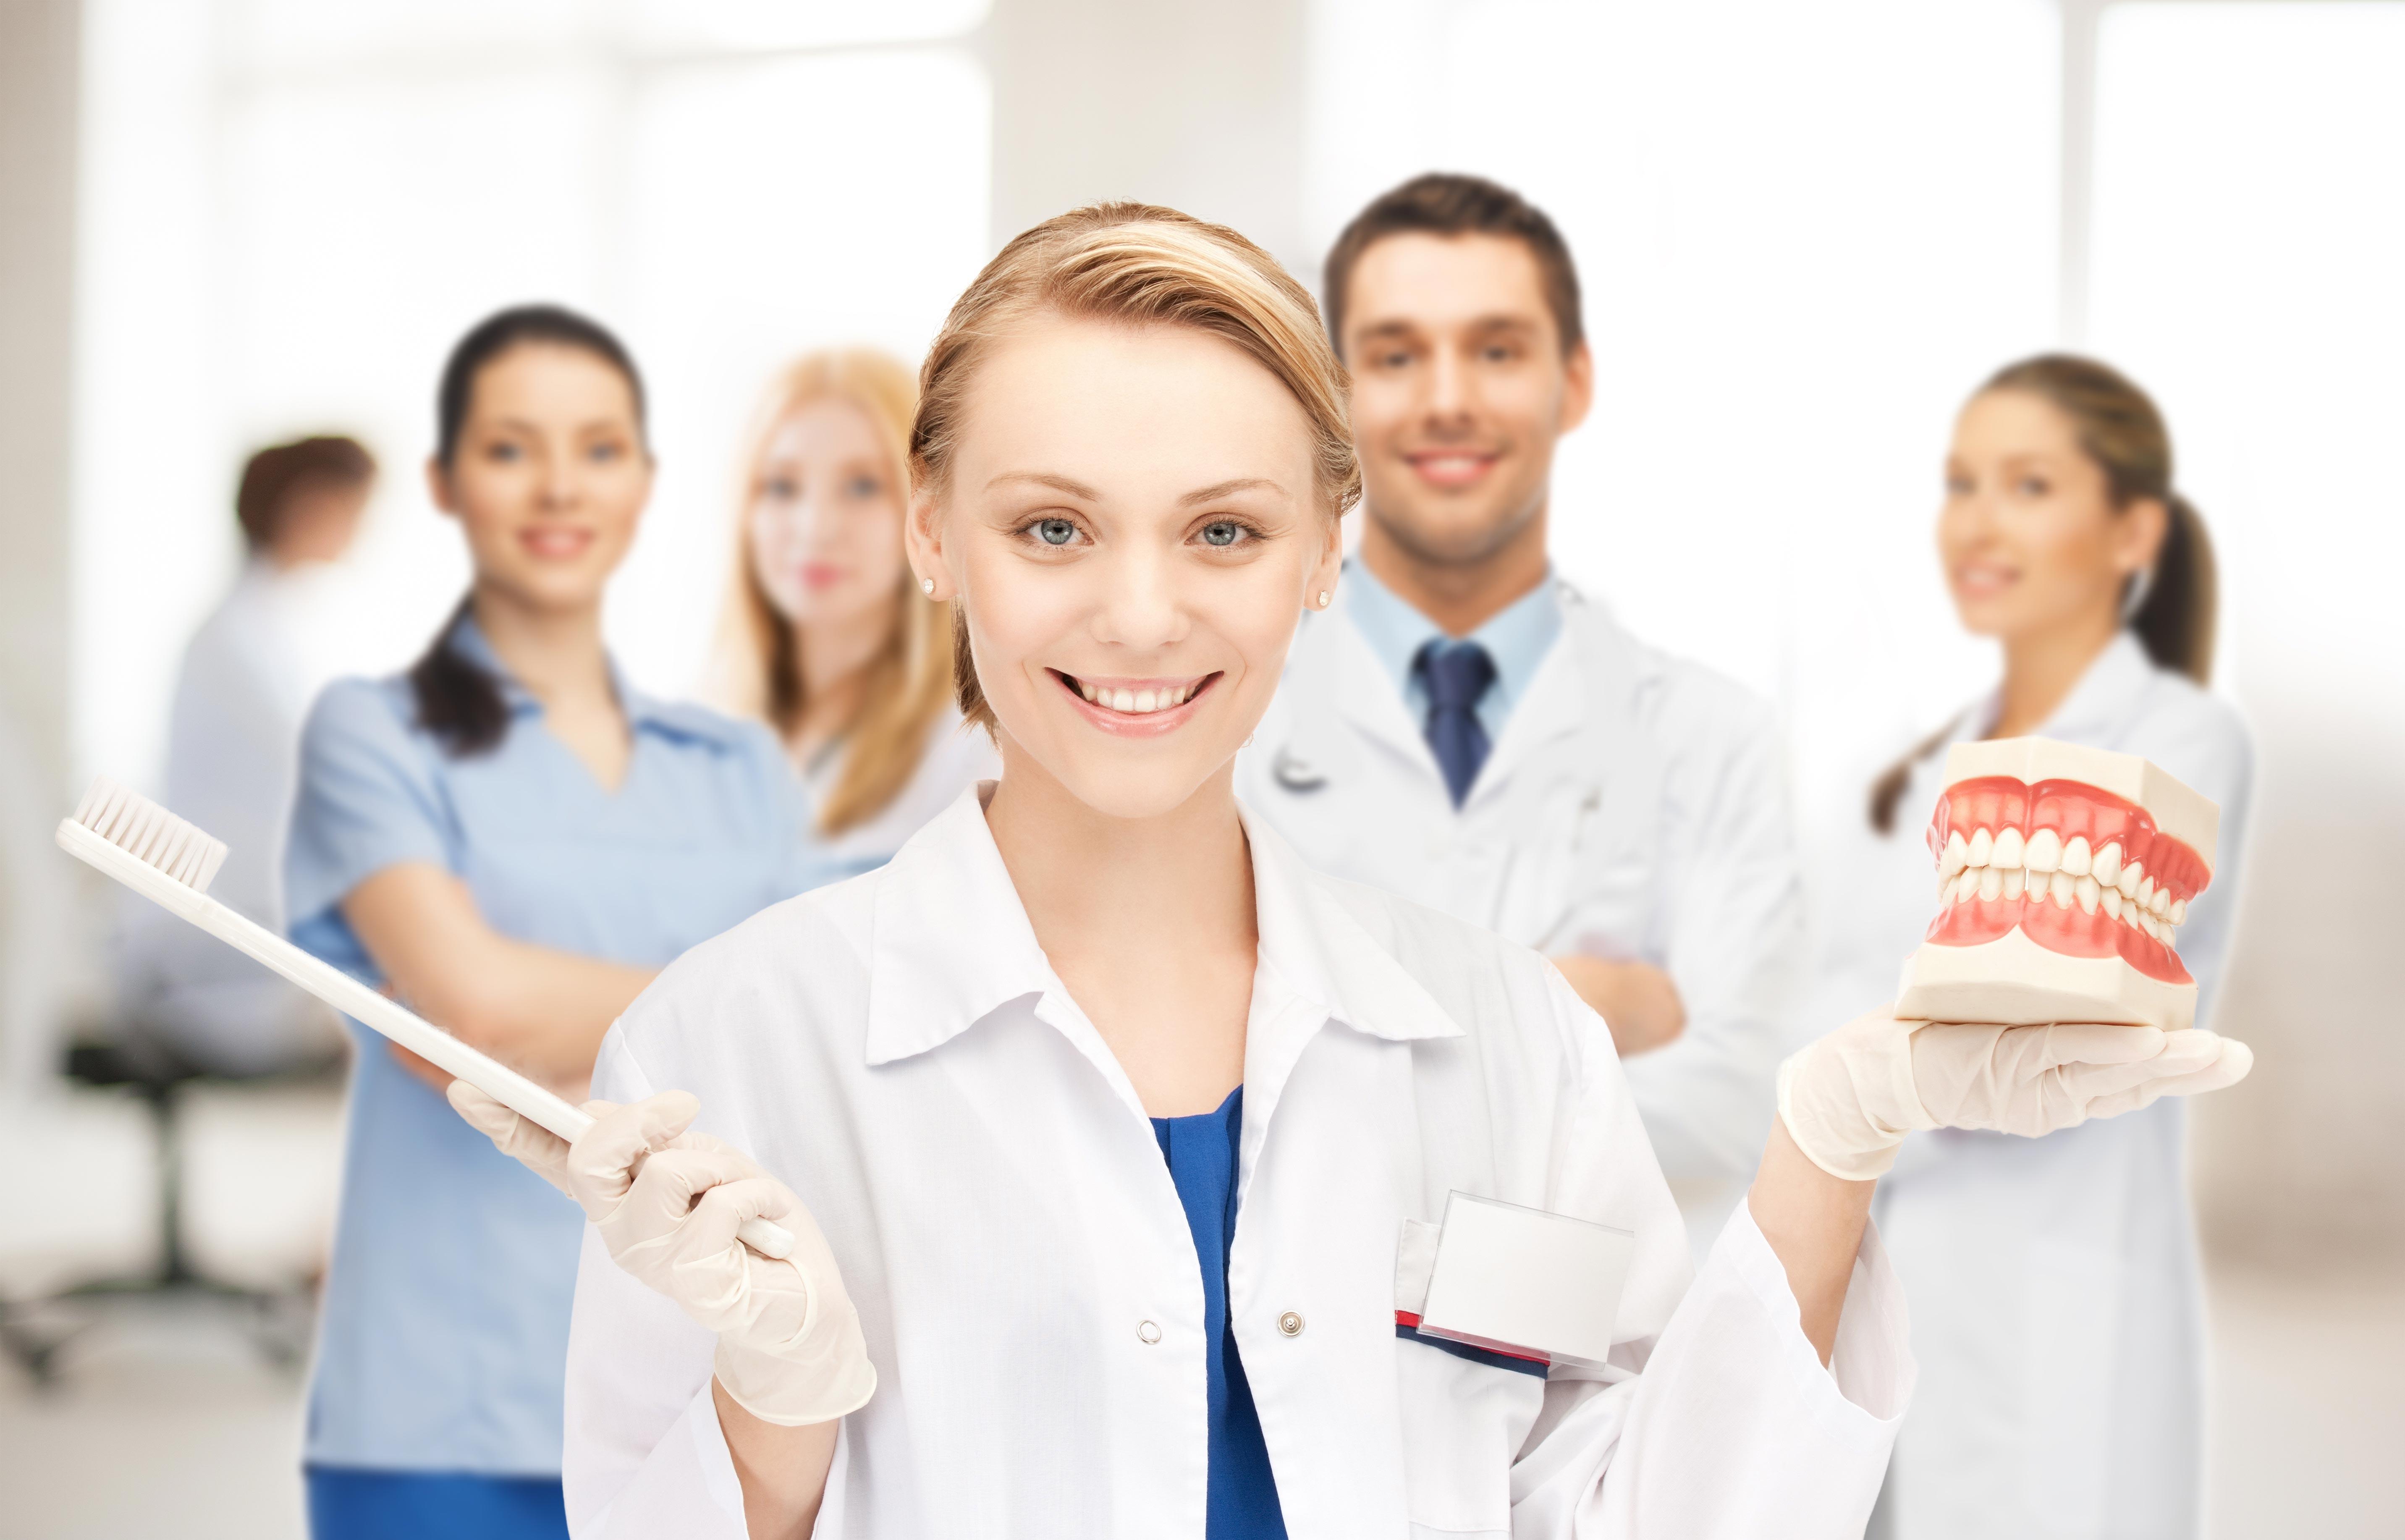 Odontologia: especialidades